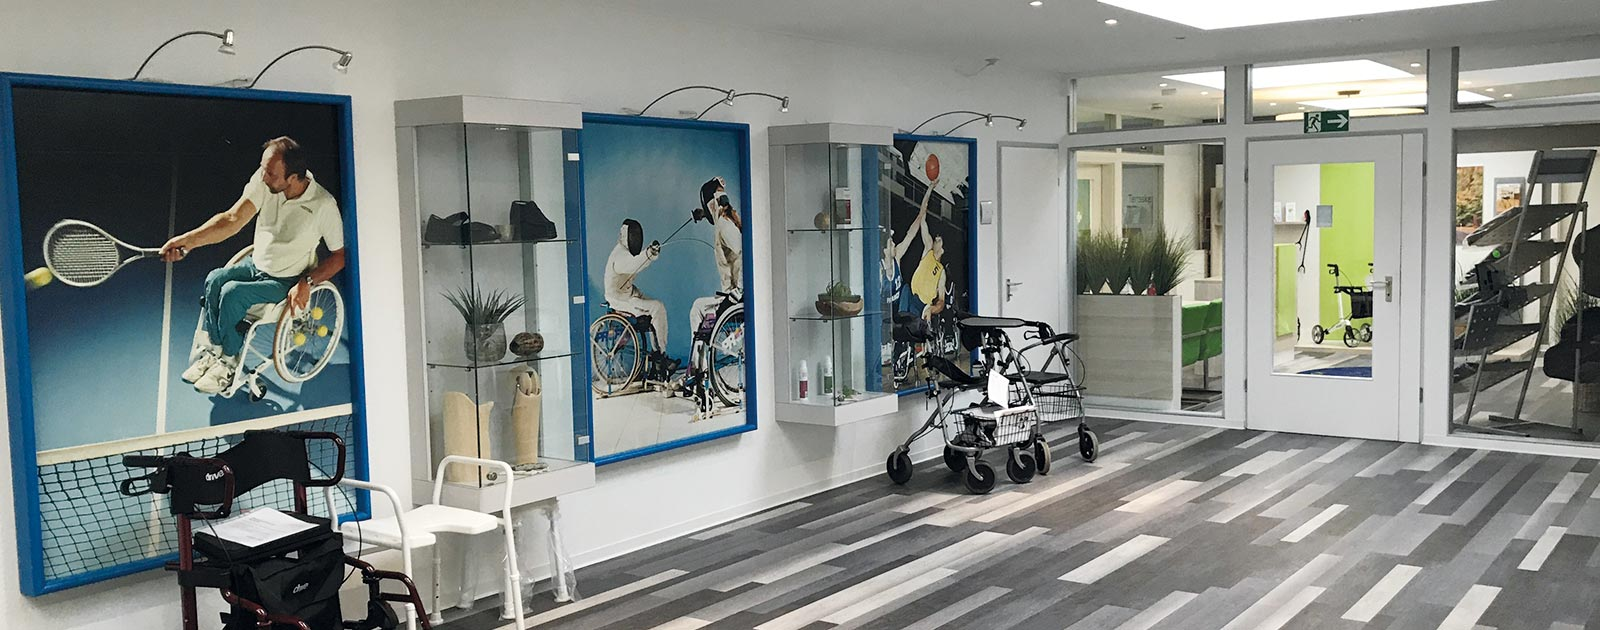 Teraske Reha, Homecare und Orthopädietechnik in Coppenbrügge